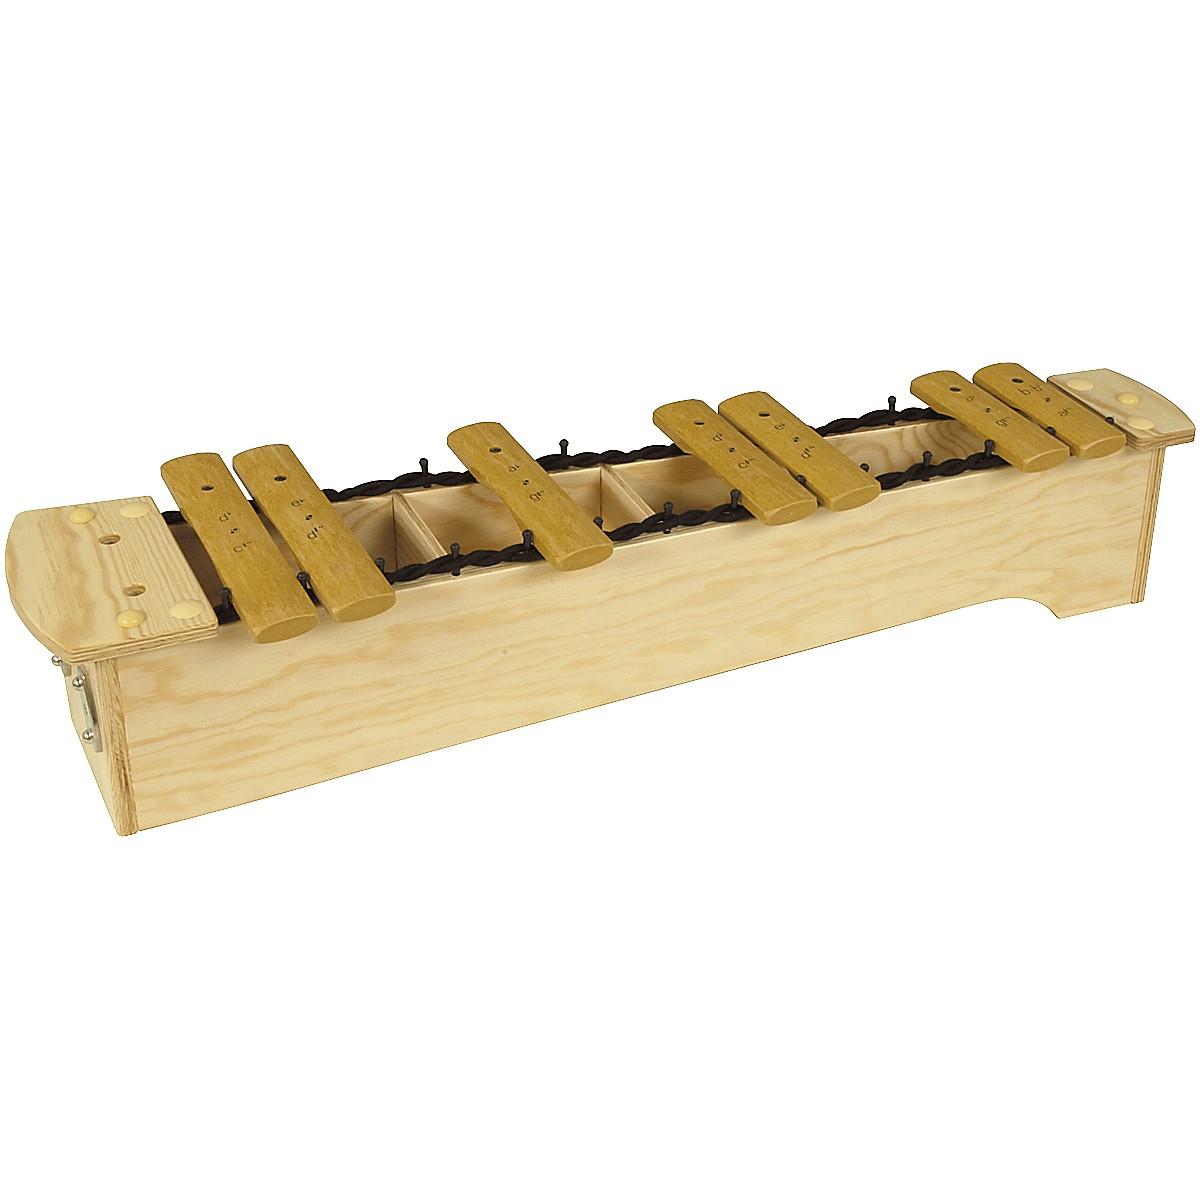 Sonor Orff Palisono Soprano Xylophone Chromatic Add-On